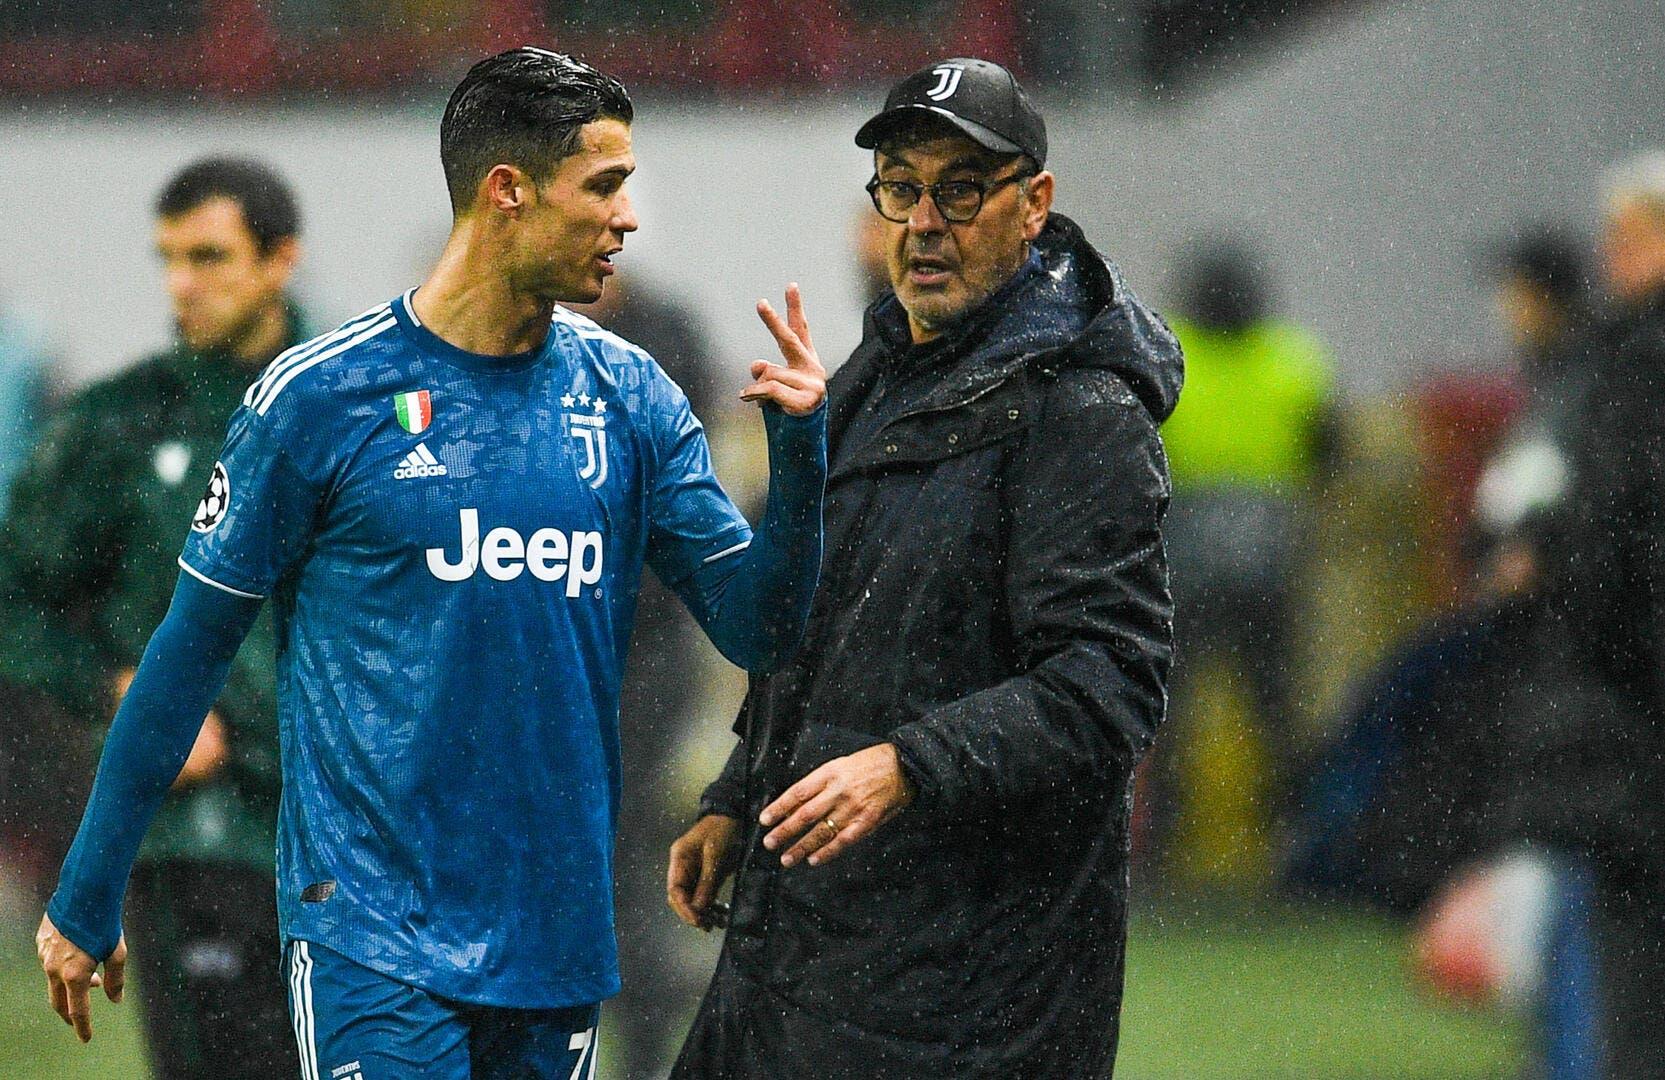 Ita : De retour à la Juve, Cristiano Ronaldo se fait calmer direct